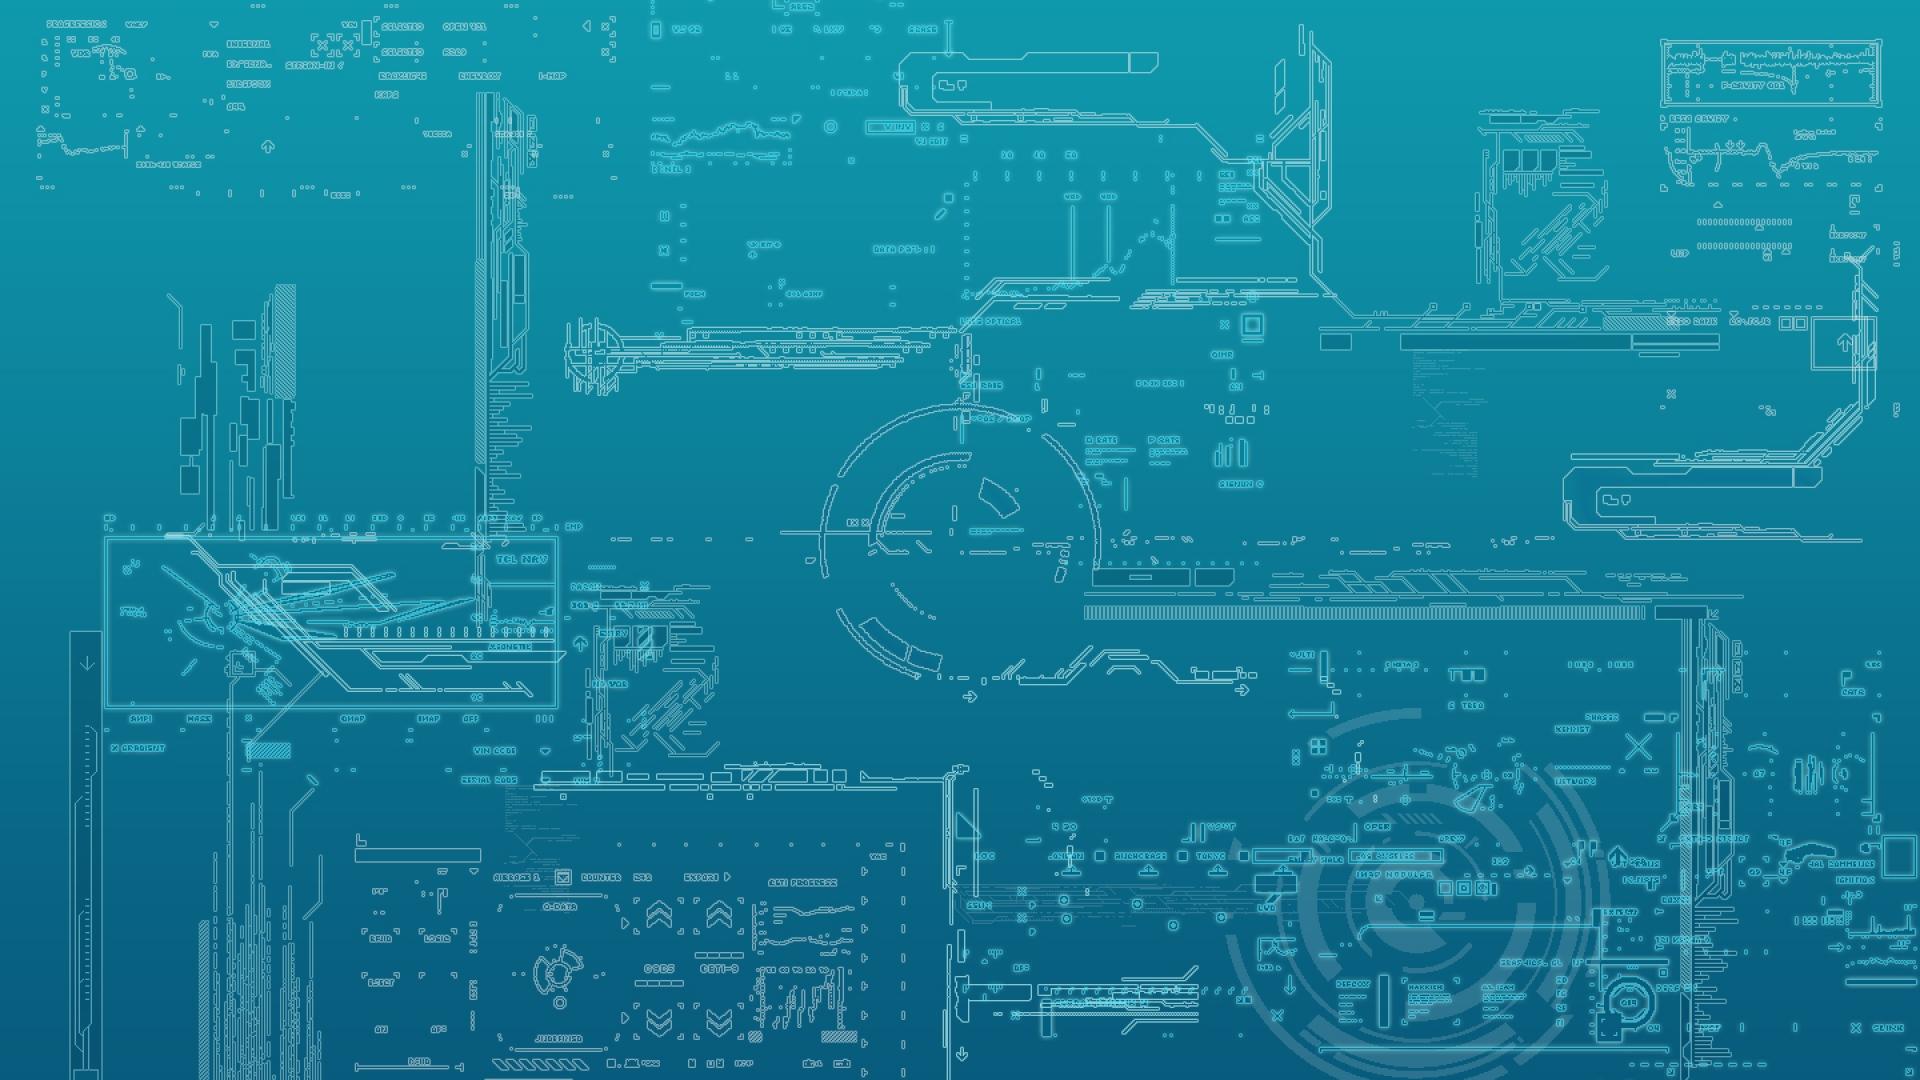 For Laptop Monitor Wiring Diagram Circuit Wallpaper Hd Wallpaper